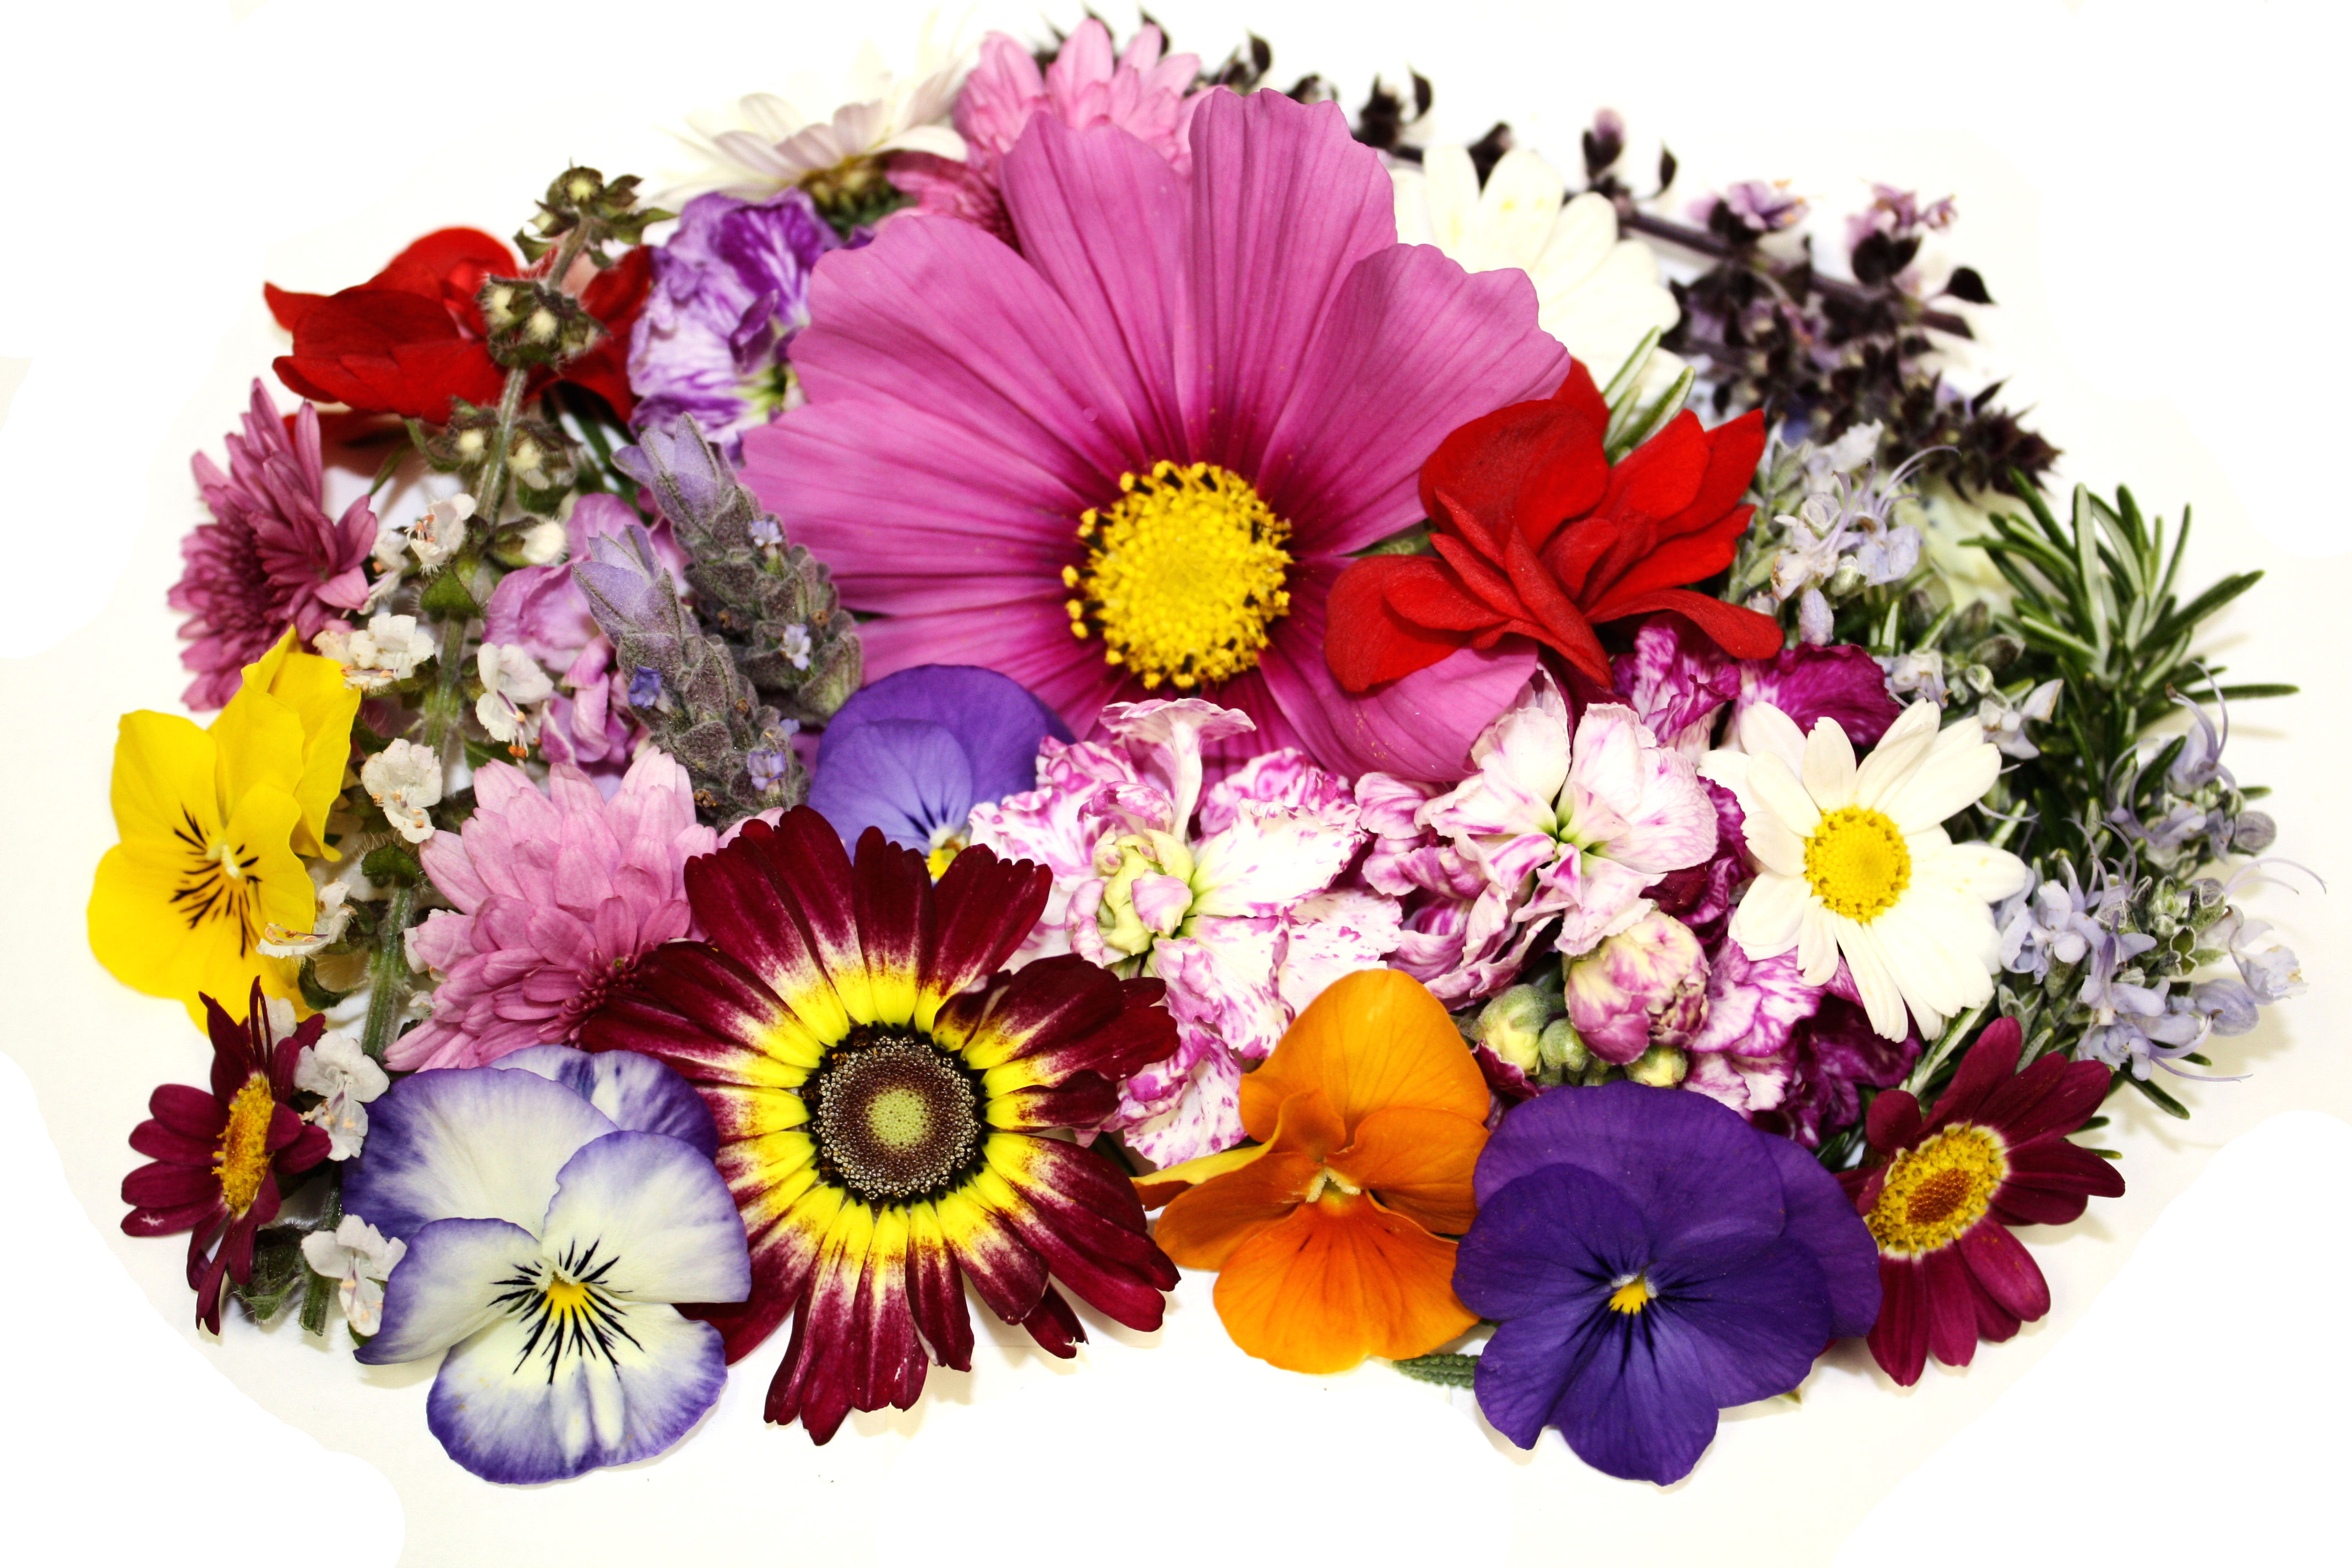 Celebrating Motherhood: Fresh Origins' Edible Spring Flowers!